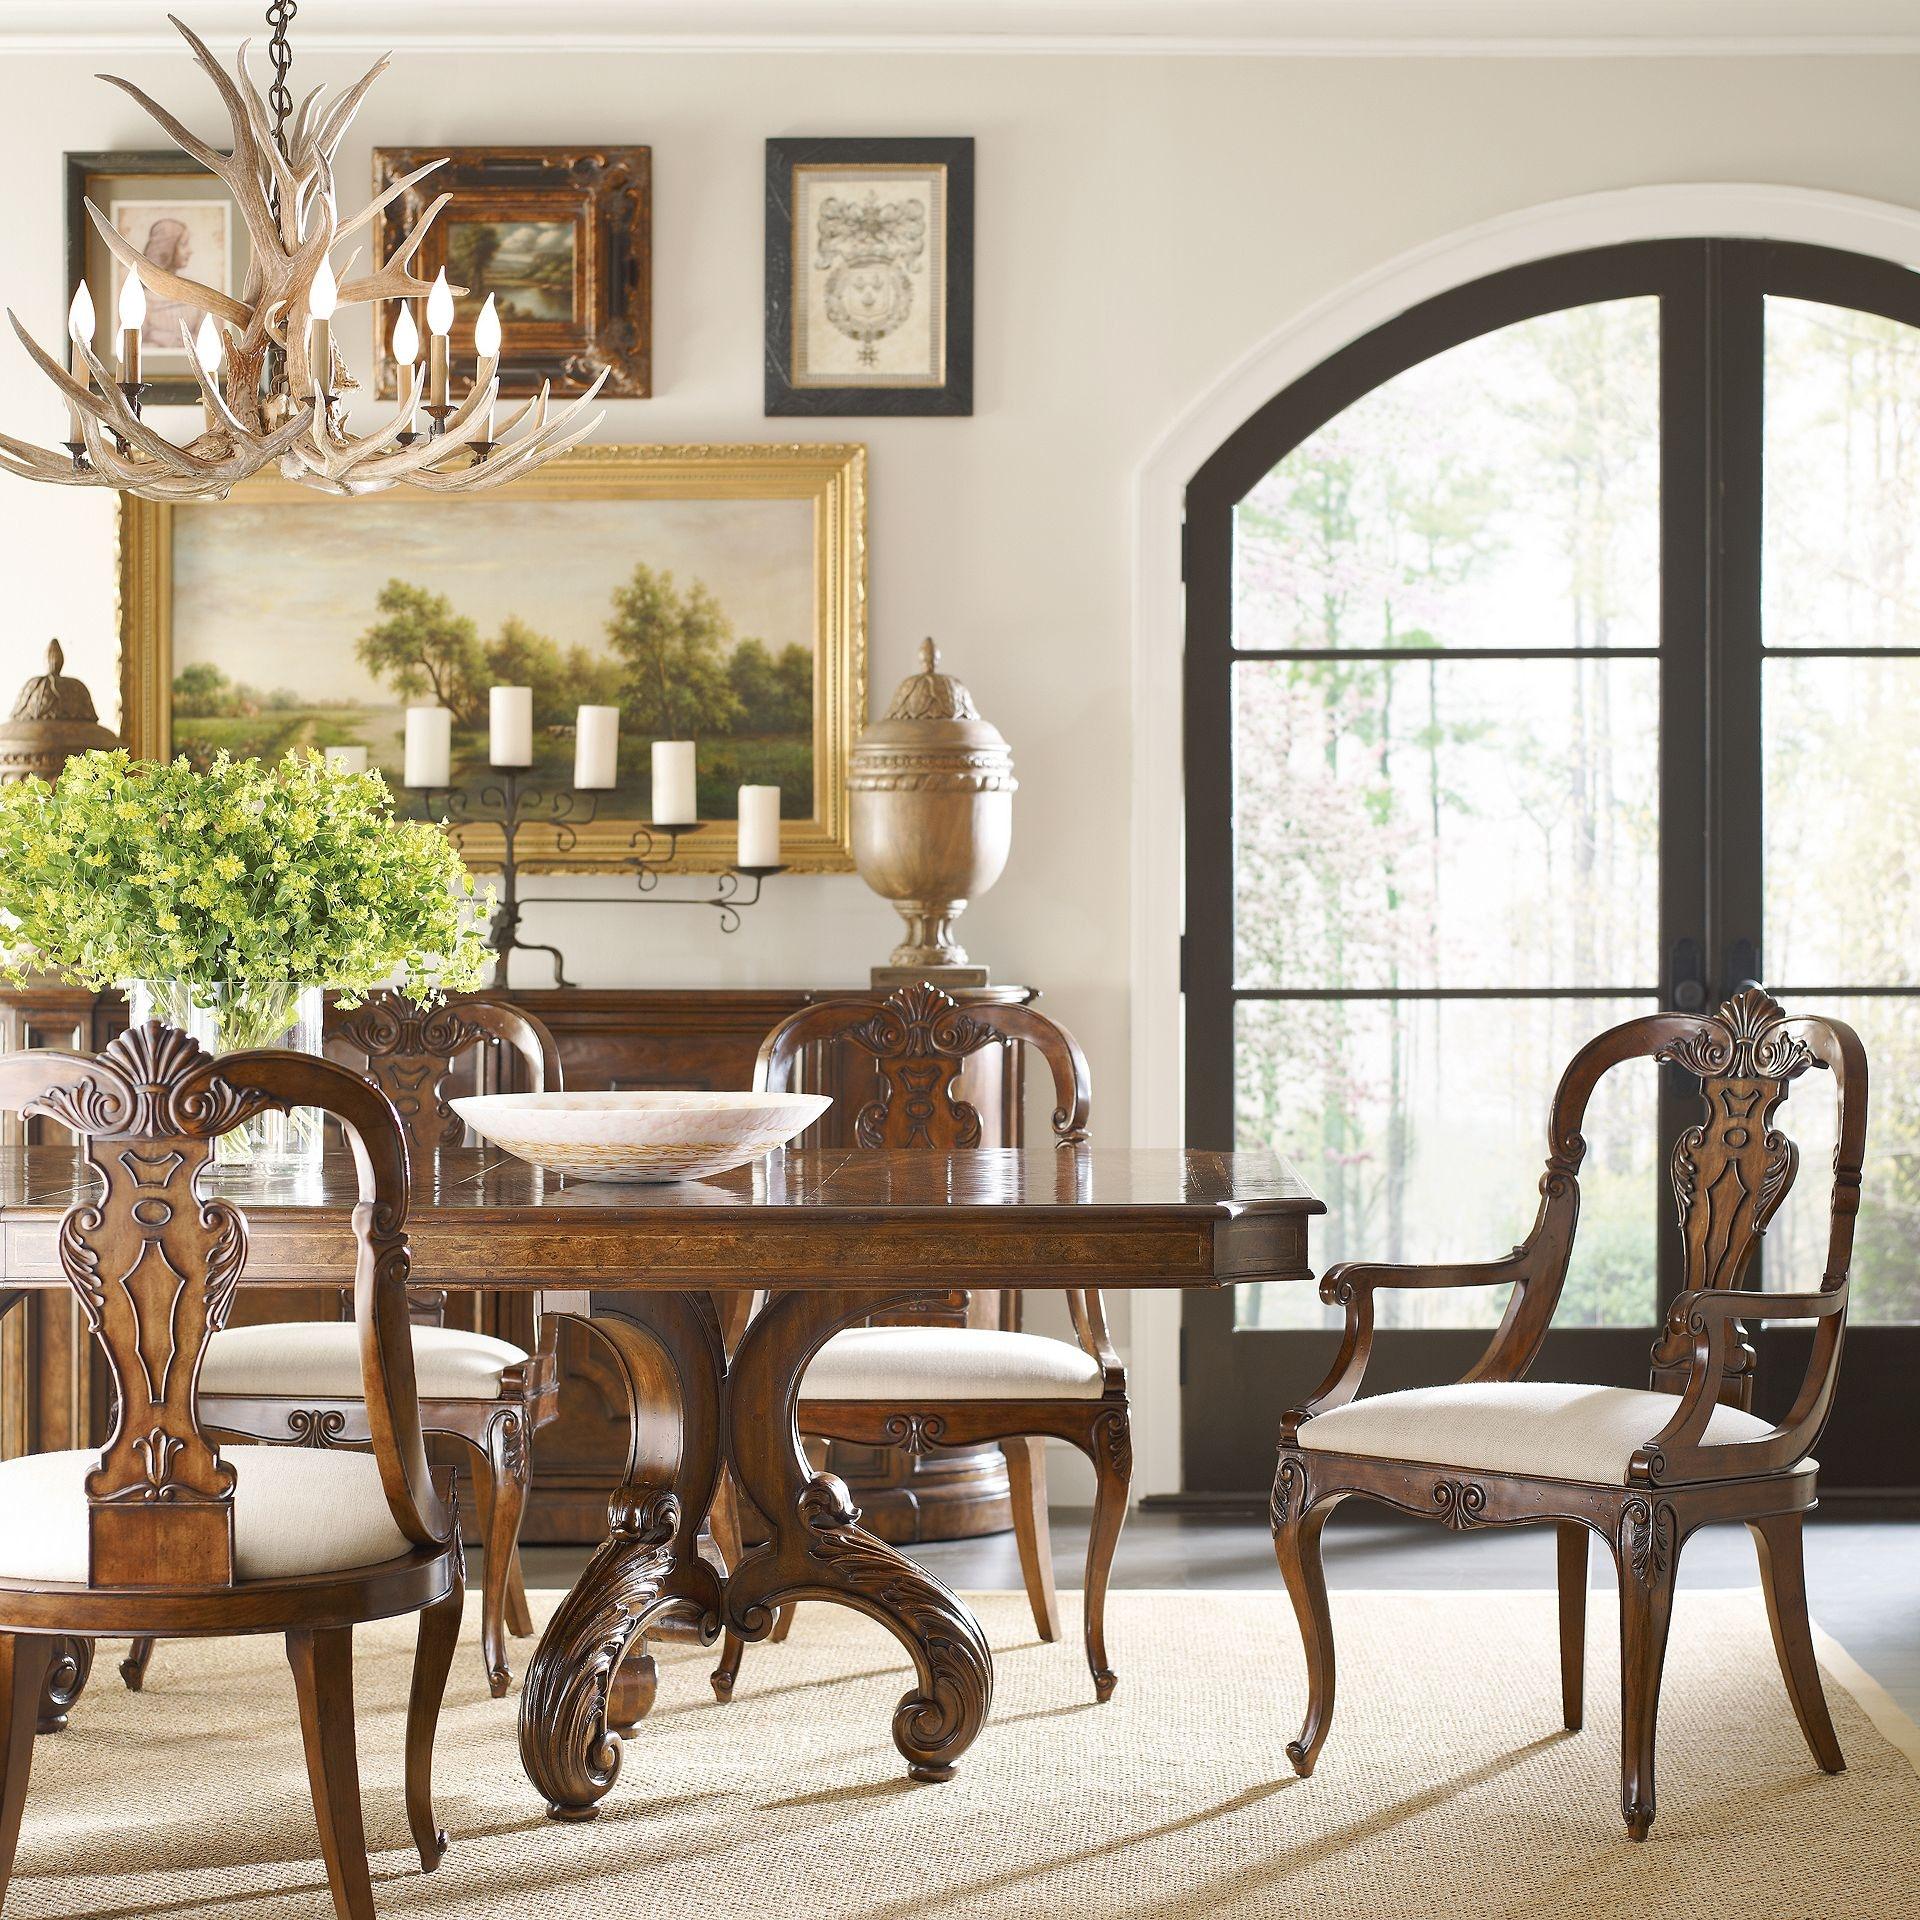 henredon furniture villarosa dining table 260120b 260120t